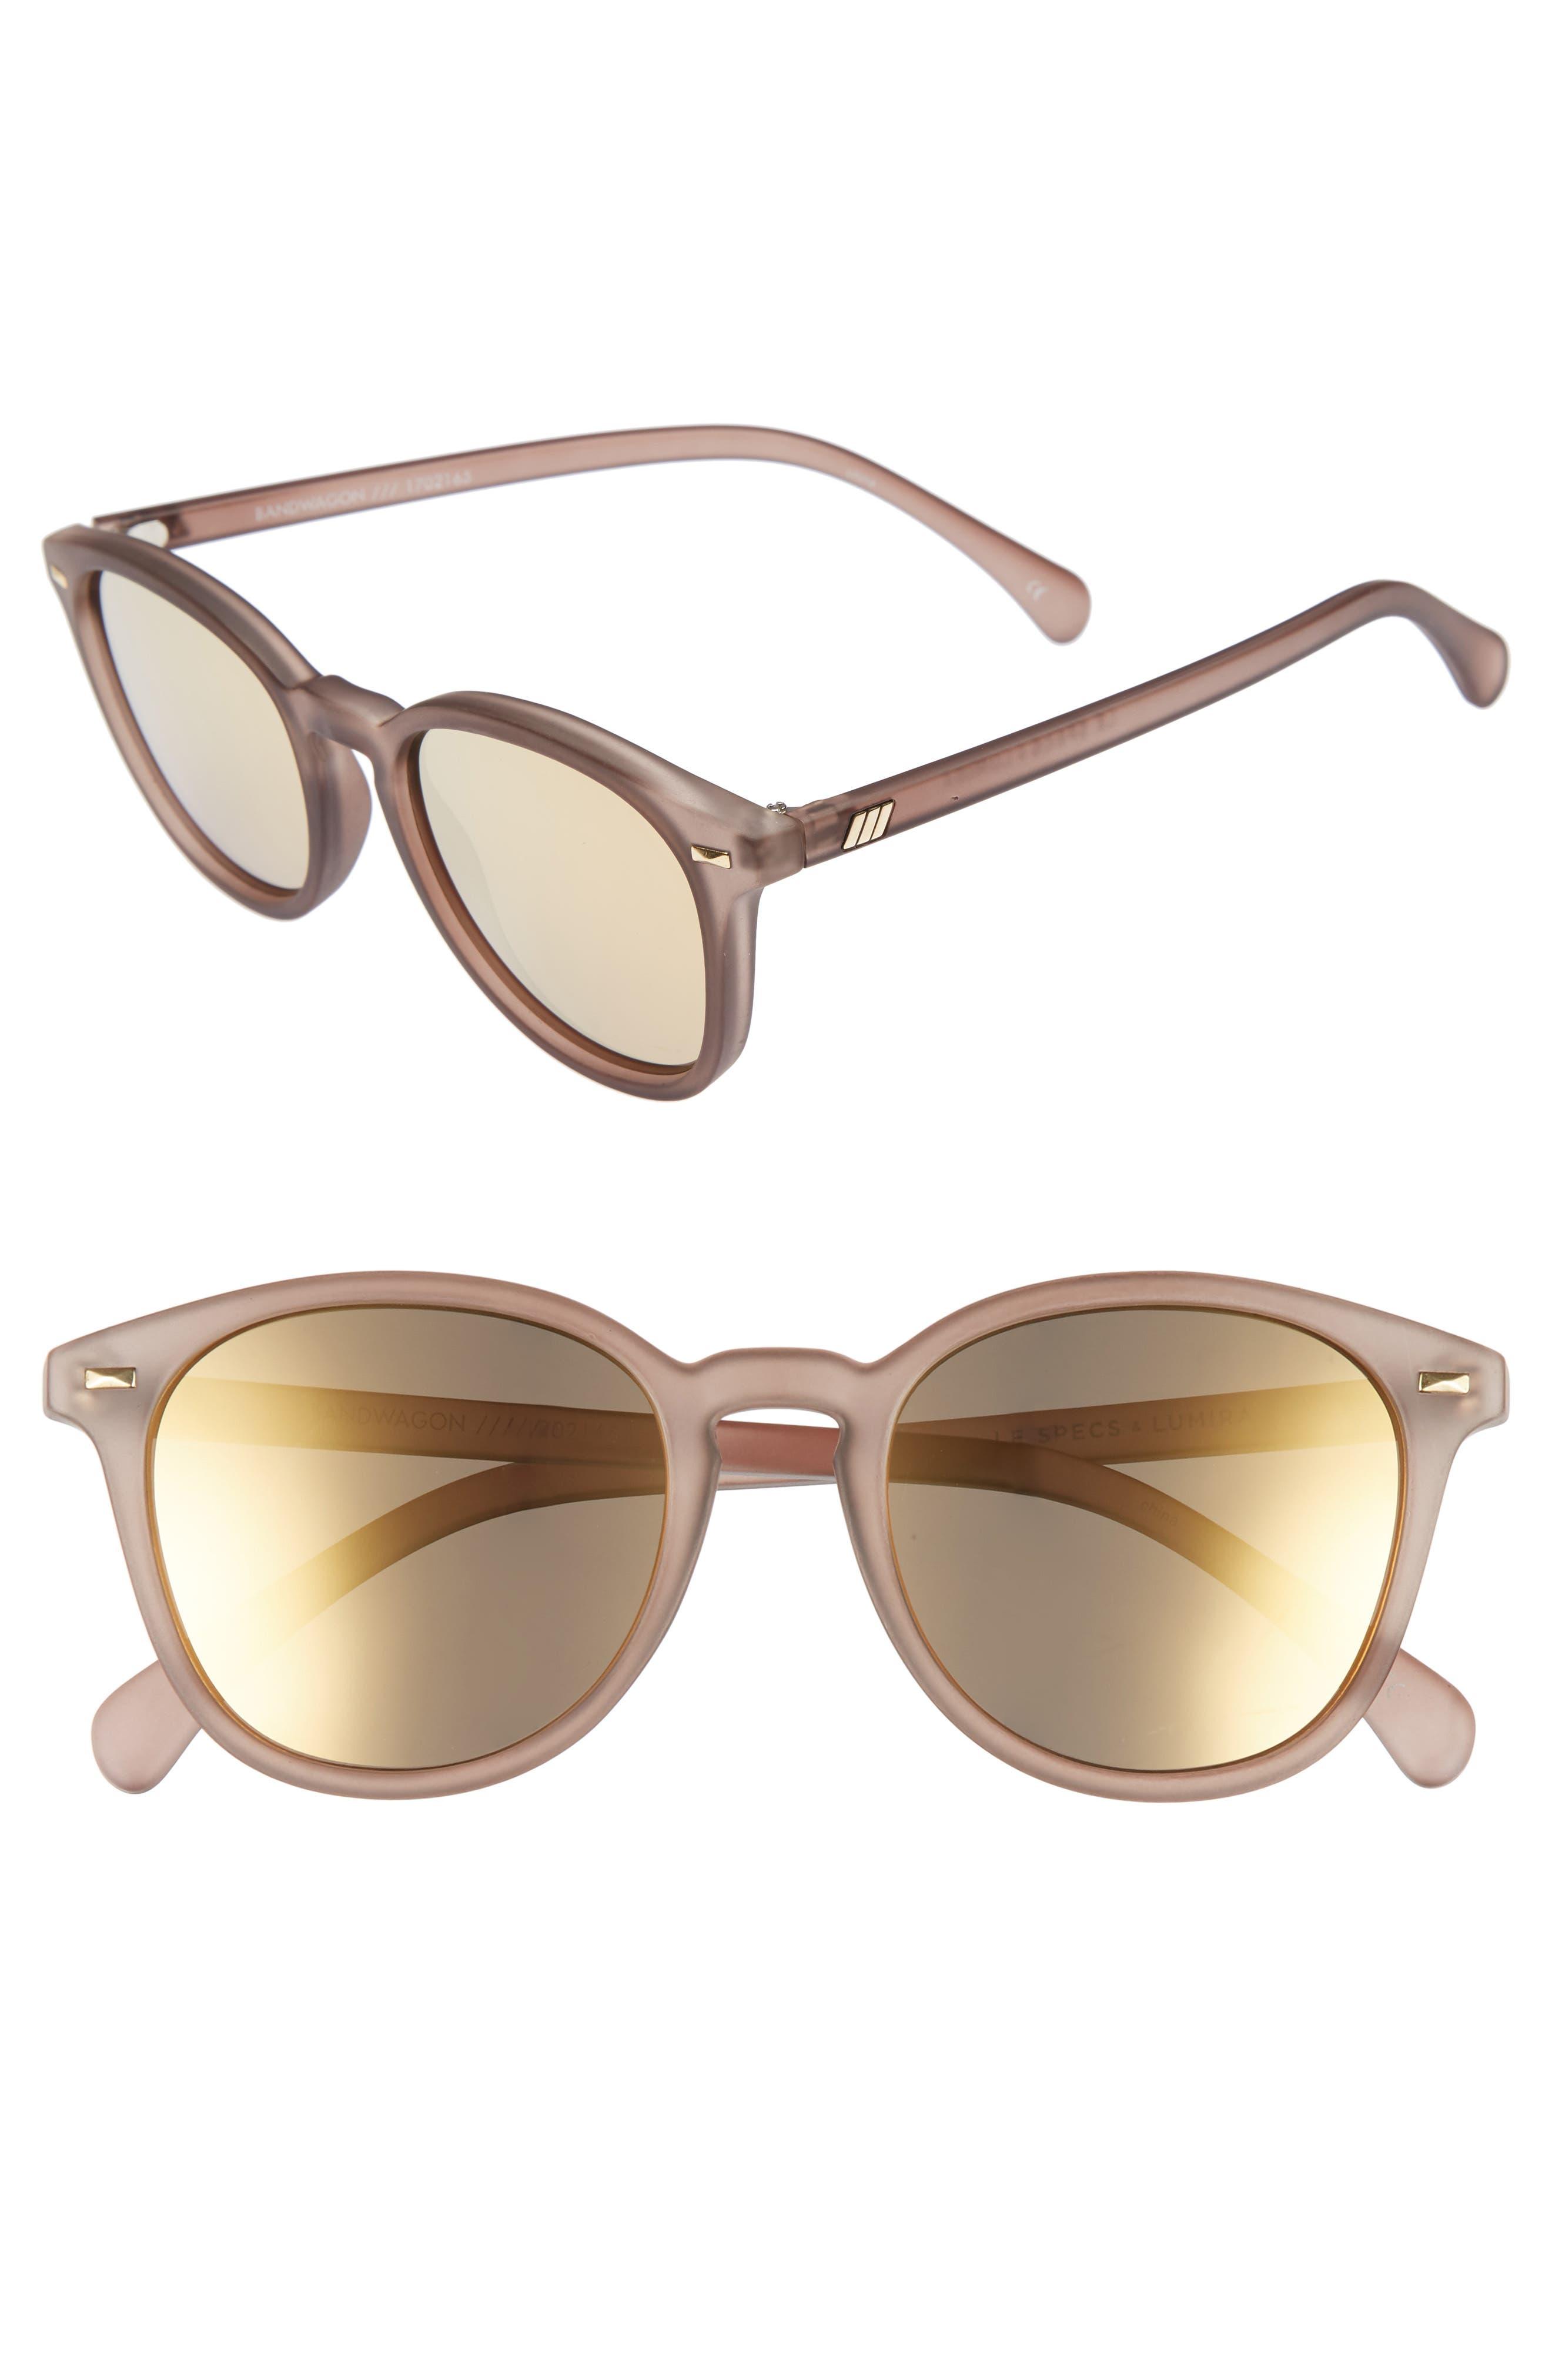 Main Image - Le Specs x Lumira Bandwagon 51mm Sunglasses & Candle Gift Set